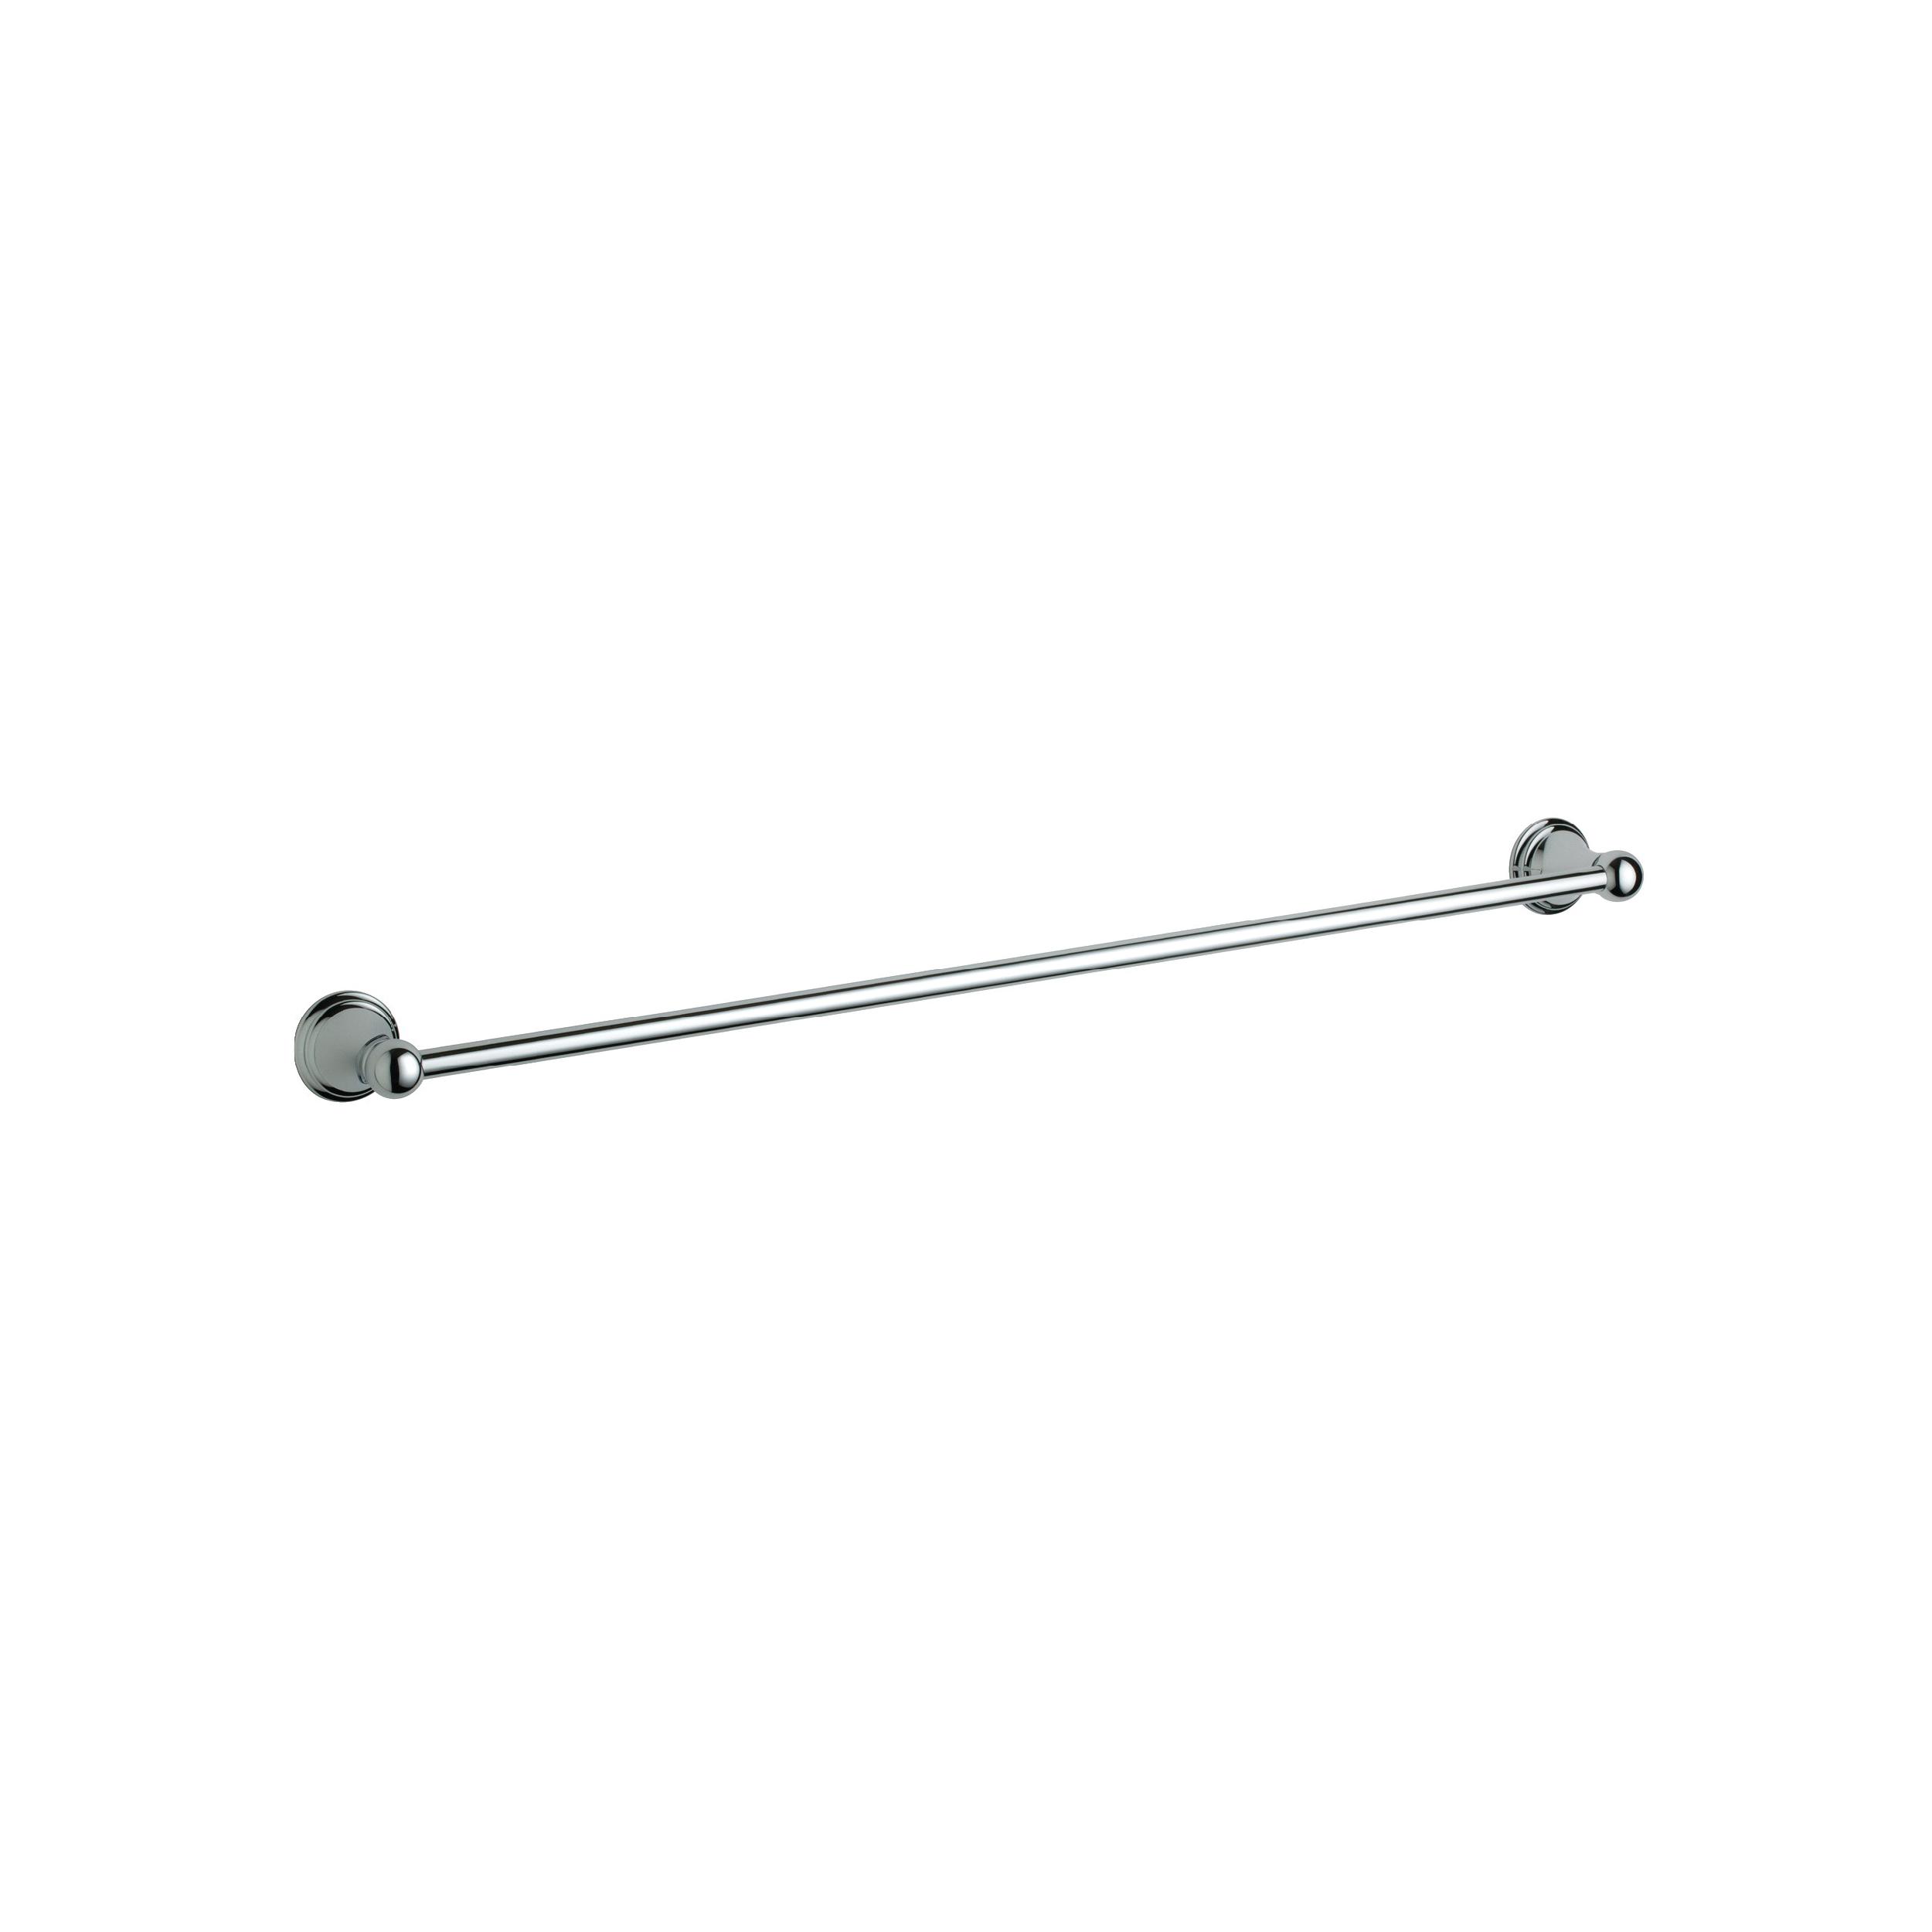 GROHE 40146000 Geneva™ Towel Rail, 24 in L Bar, 2-11/16 in OAD, Metal, Import